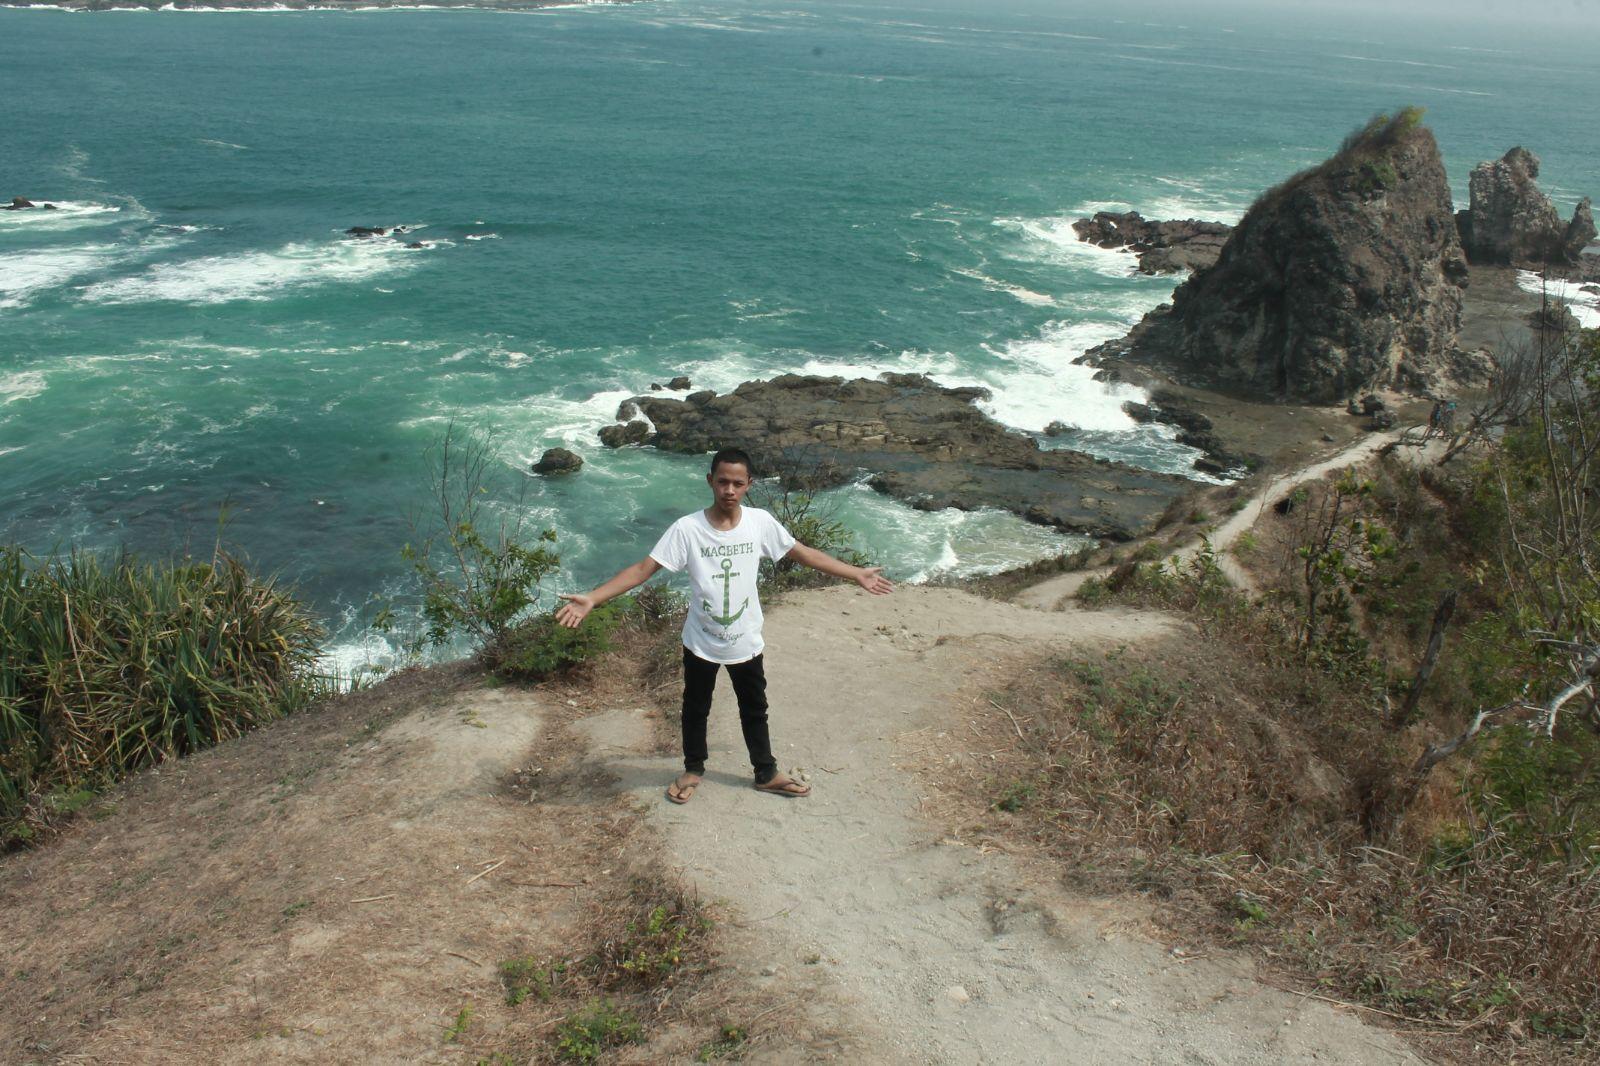 Jogja Wisata Abadi Pantai Watu Lumbung Tanah Lot Gunungkidul Keindahan